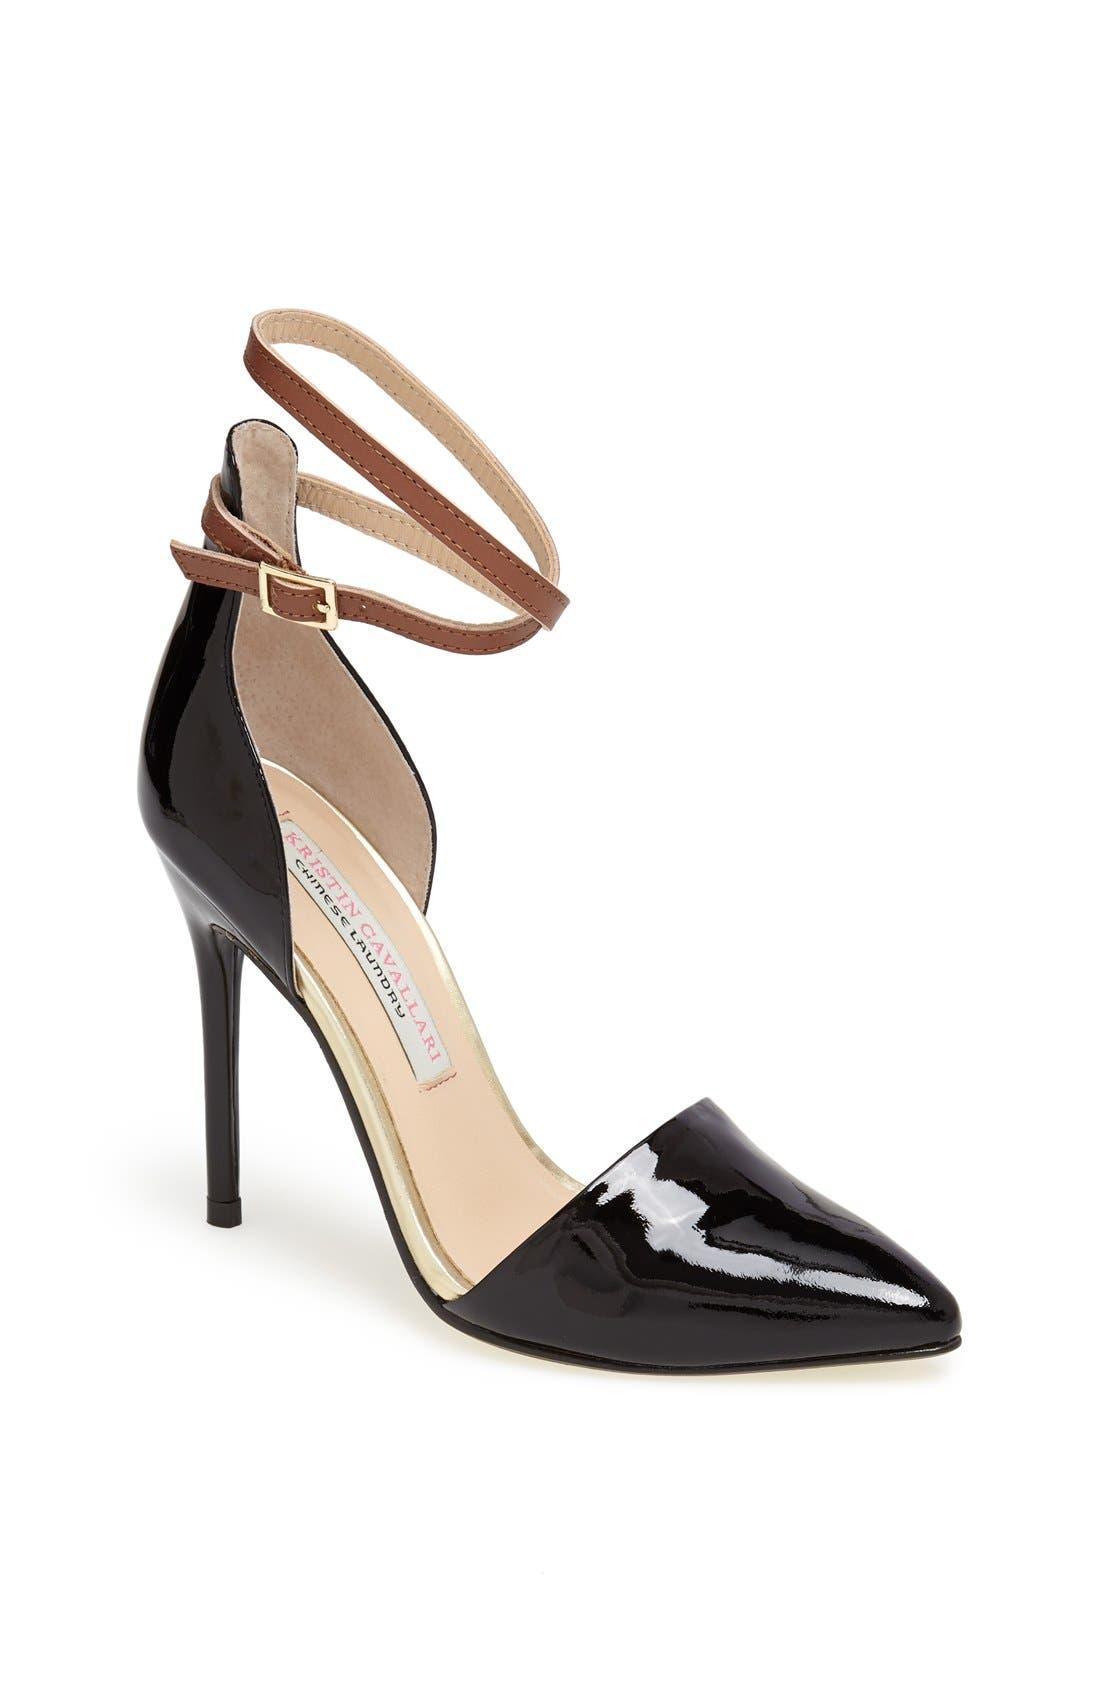 Main Image - Kristin Cavallari 'Kalea' d'Orsay Ankle Strap Pump